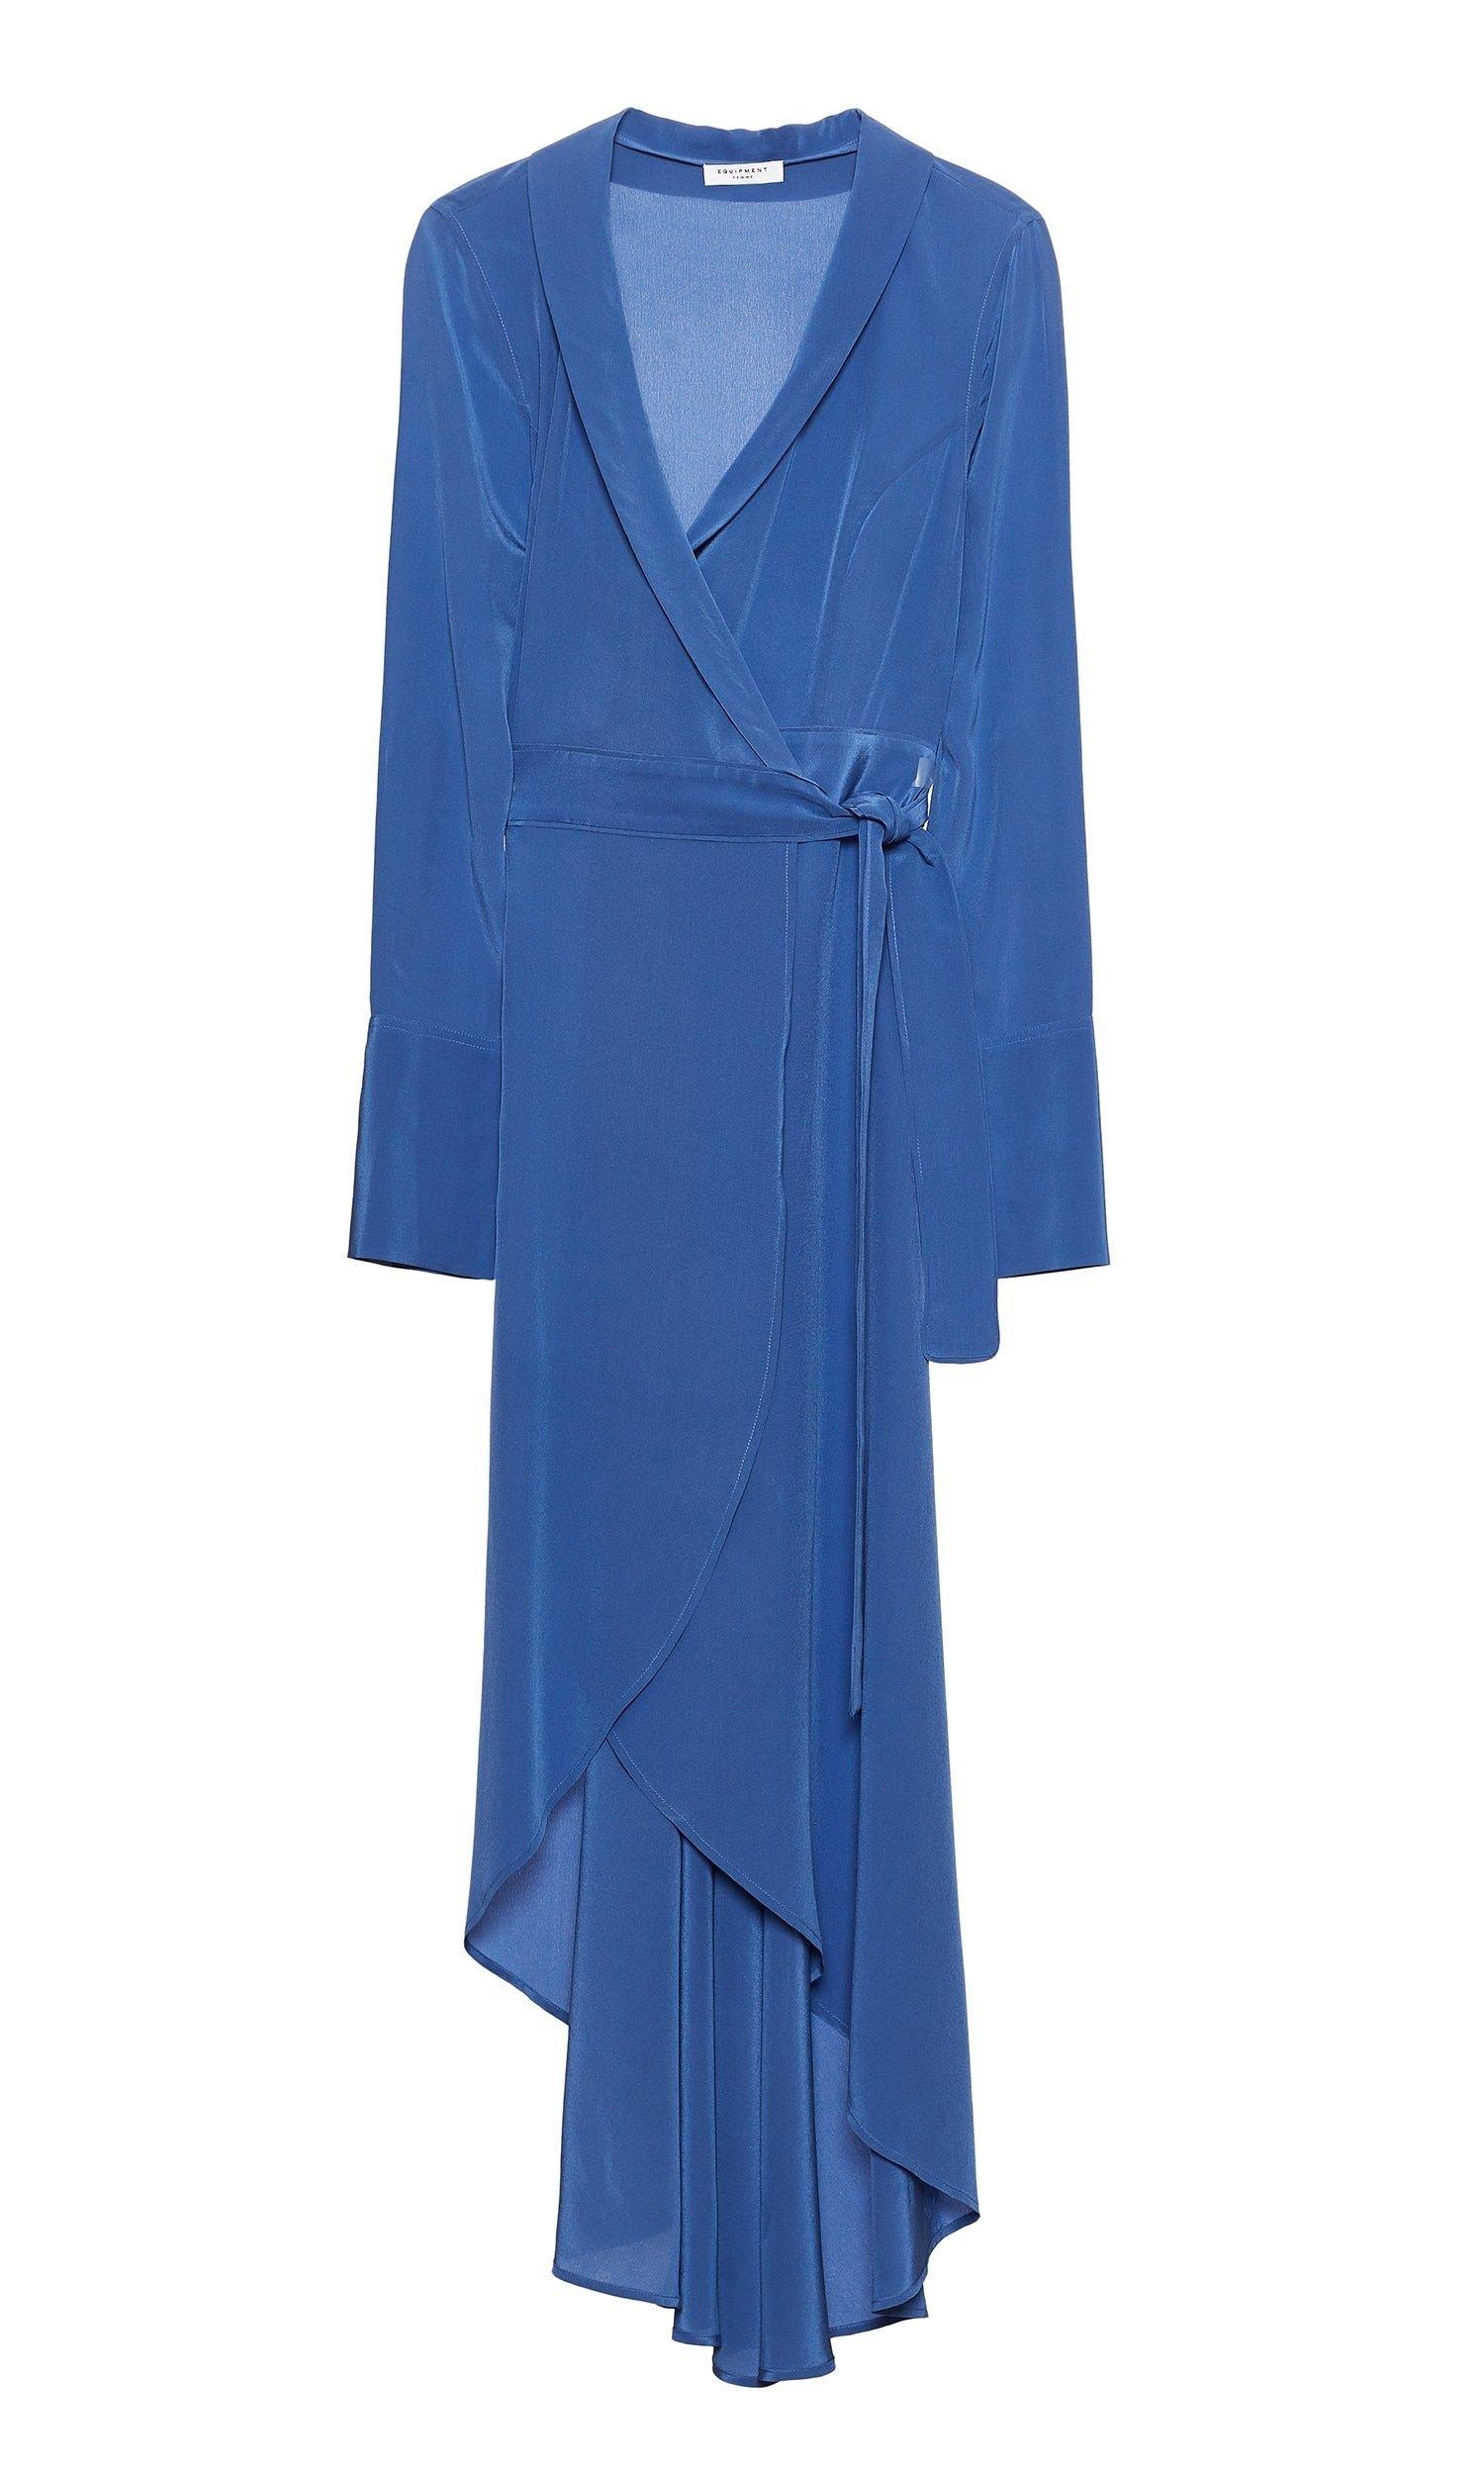 7fdc08fec3f42 GOWIN SILK DRESS